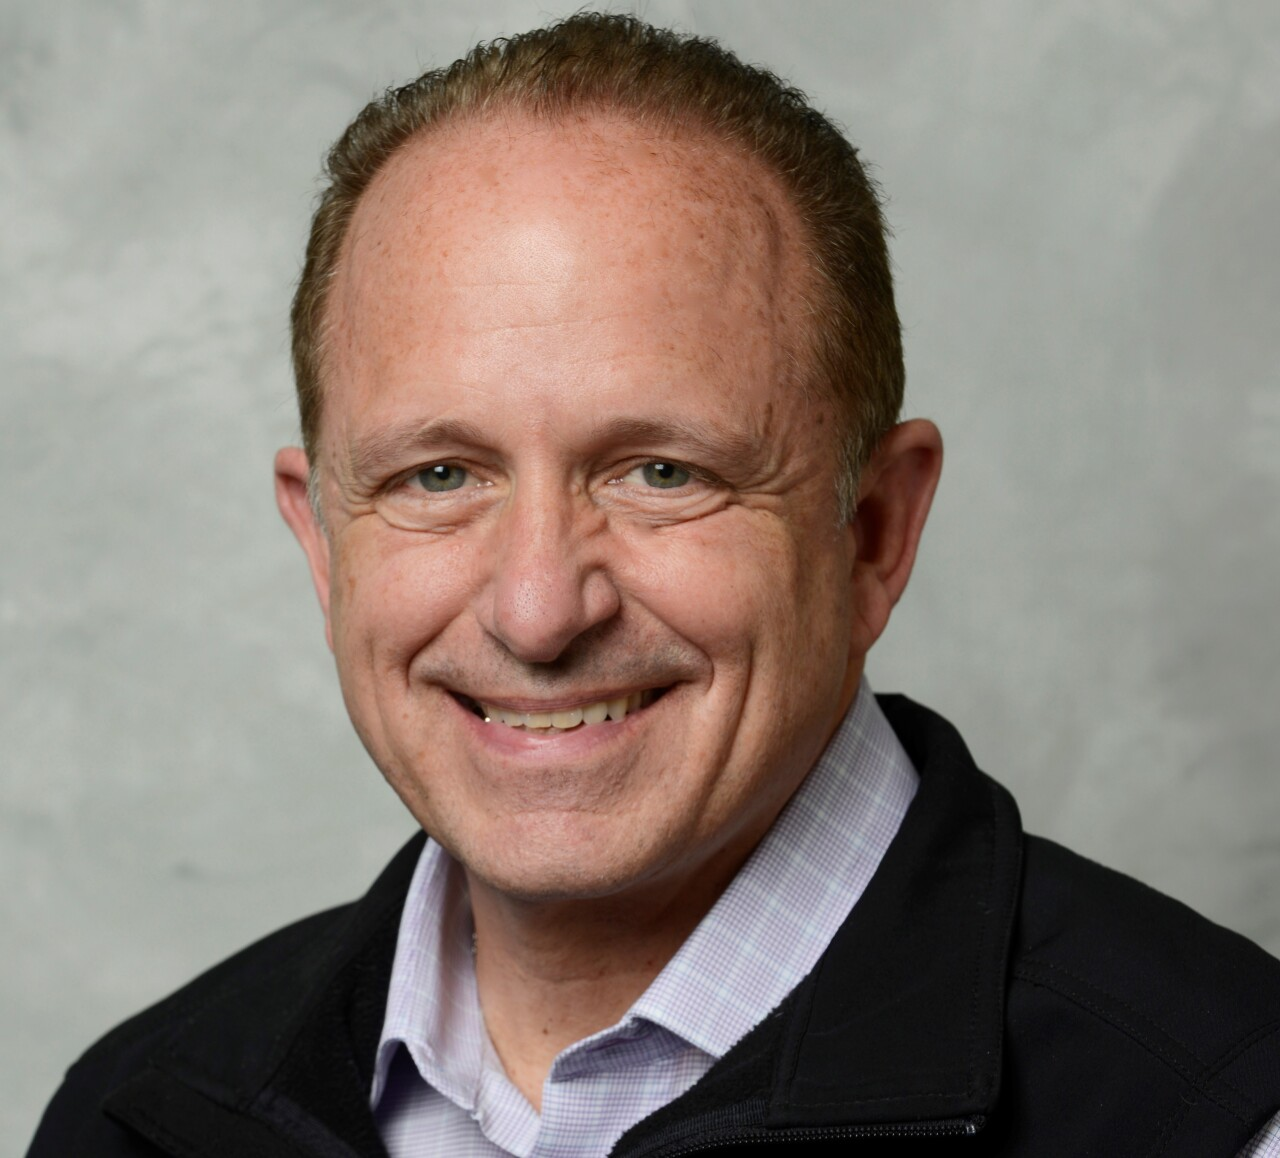 Michael LaRosa is CEO of LaRosa's.